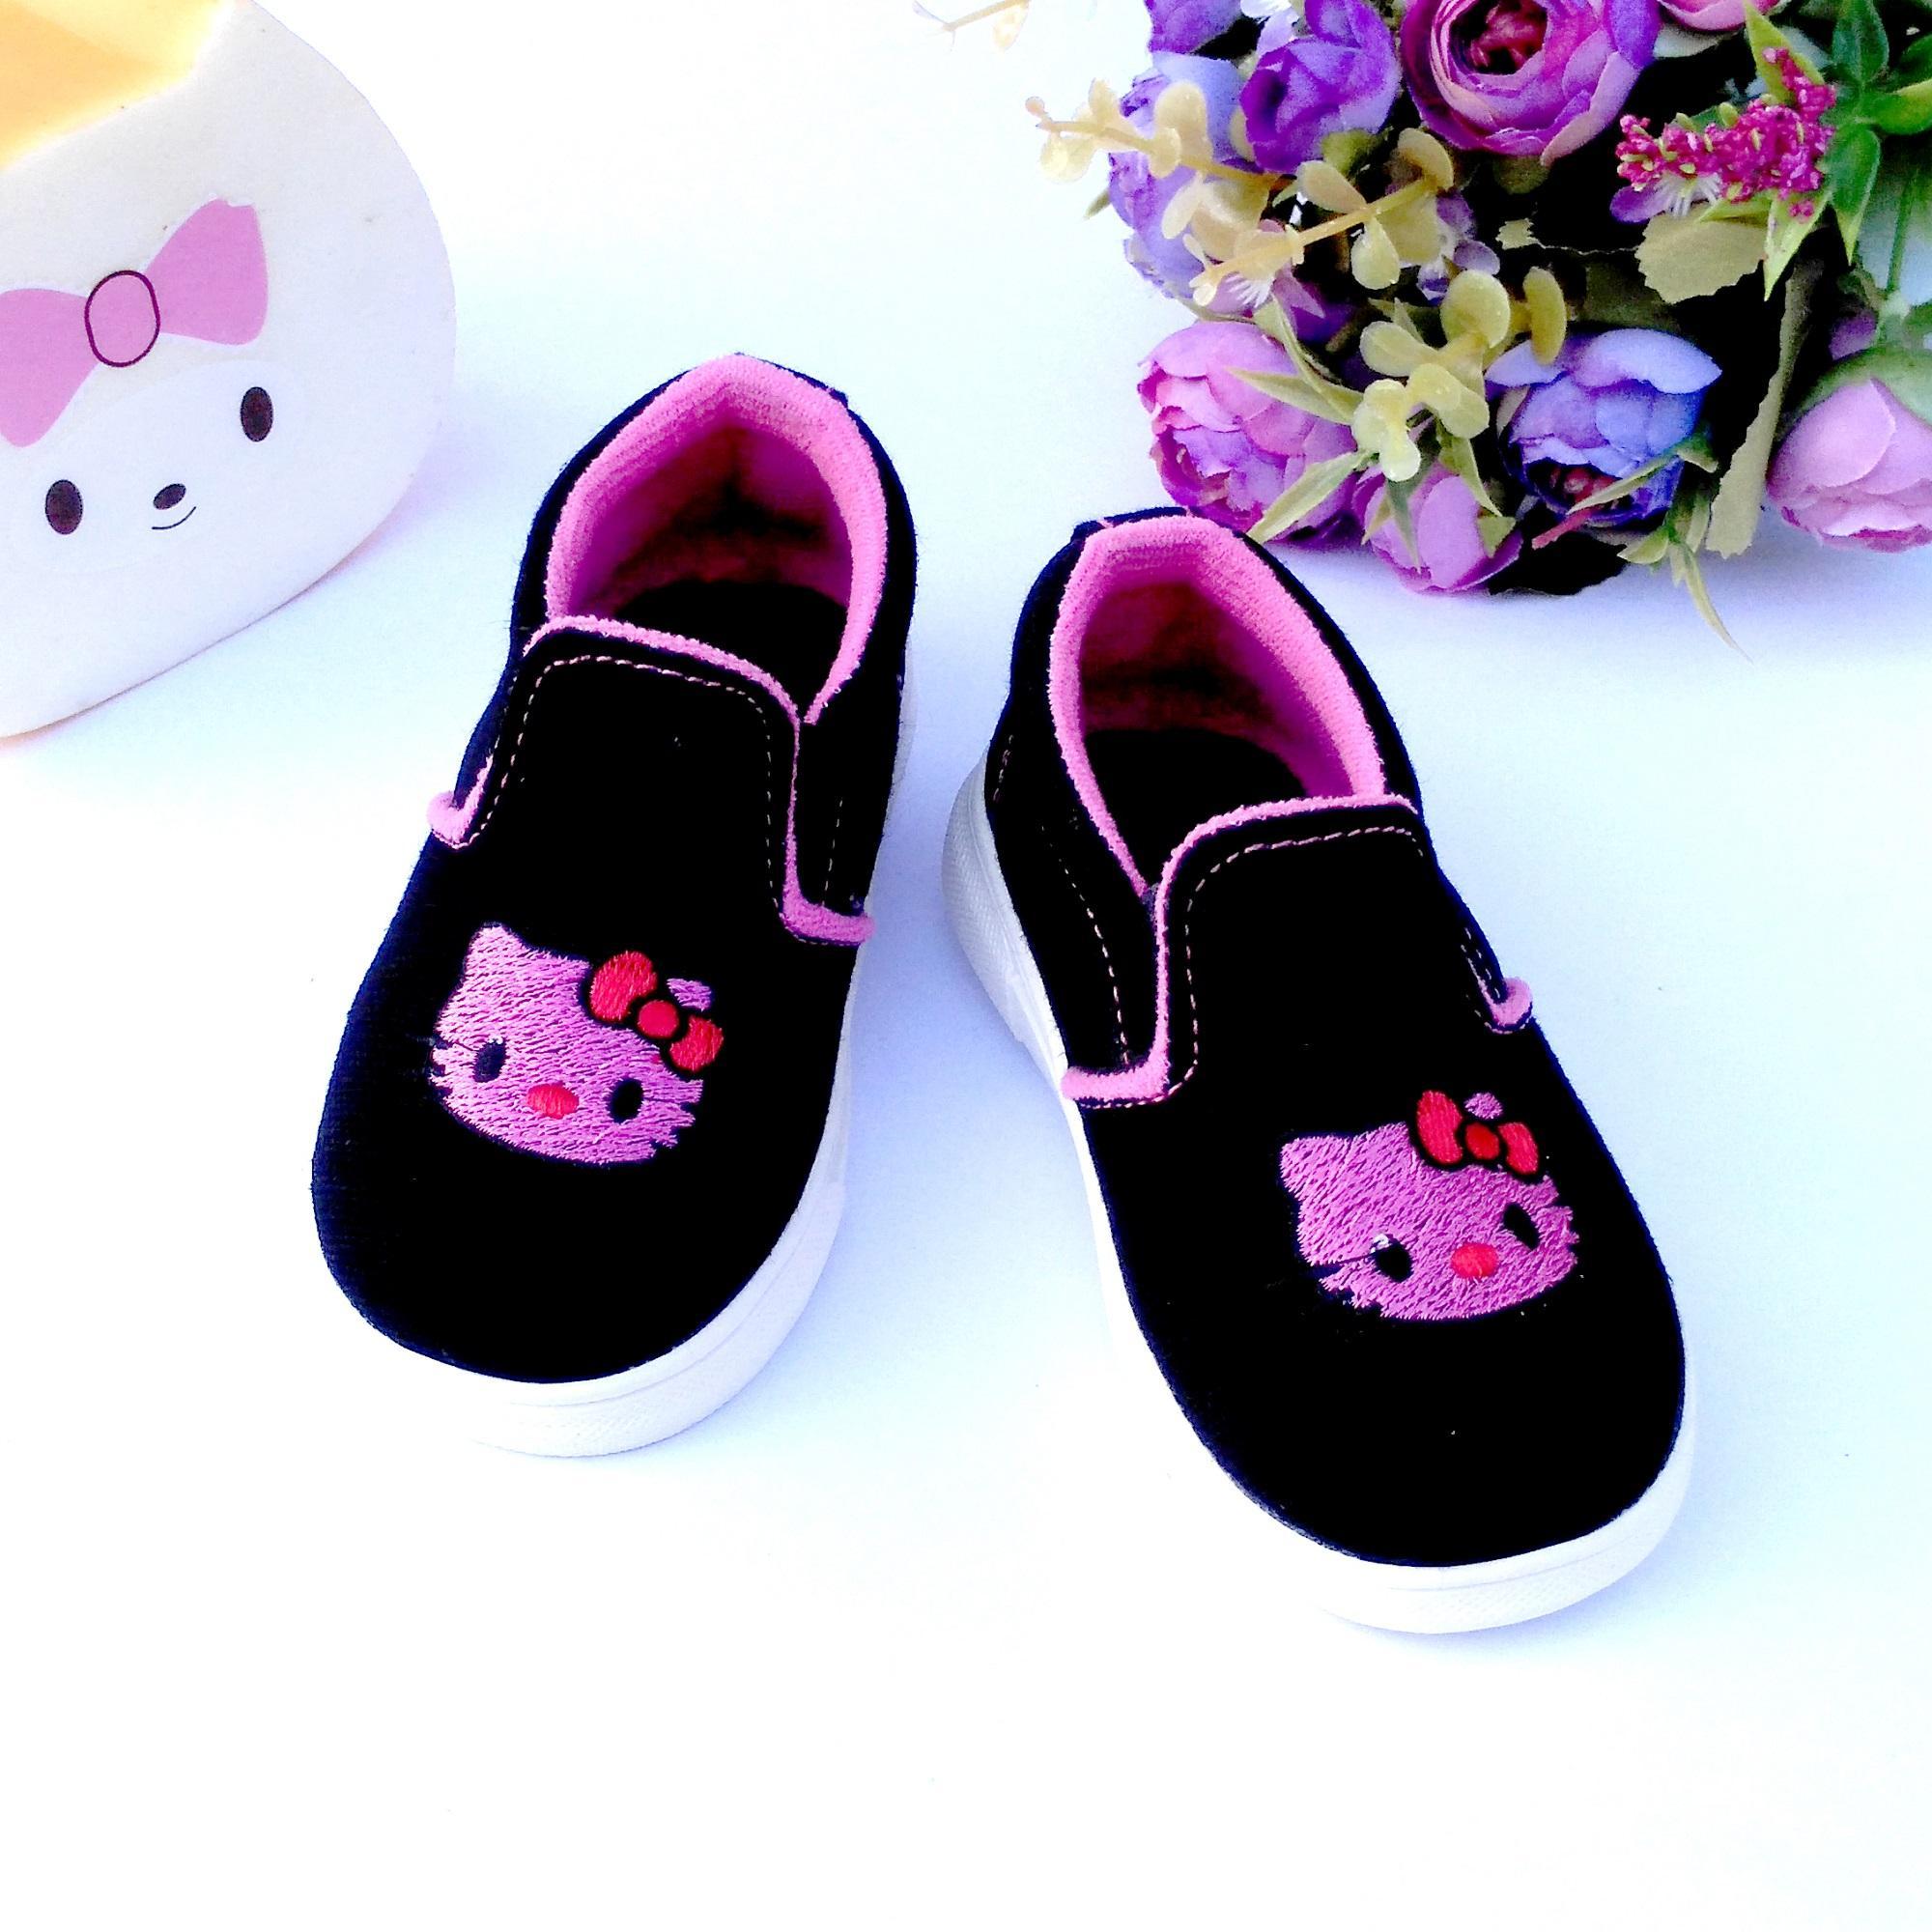 Sepatu Anak Perempuan Lucu Murah Adidas Anaksepatu Sekolah Hqo Slip On Casual Bayi Hello Kitty